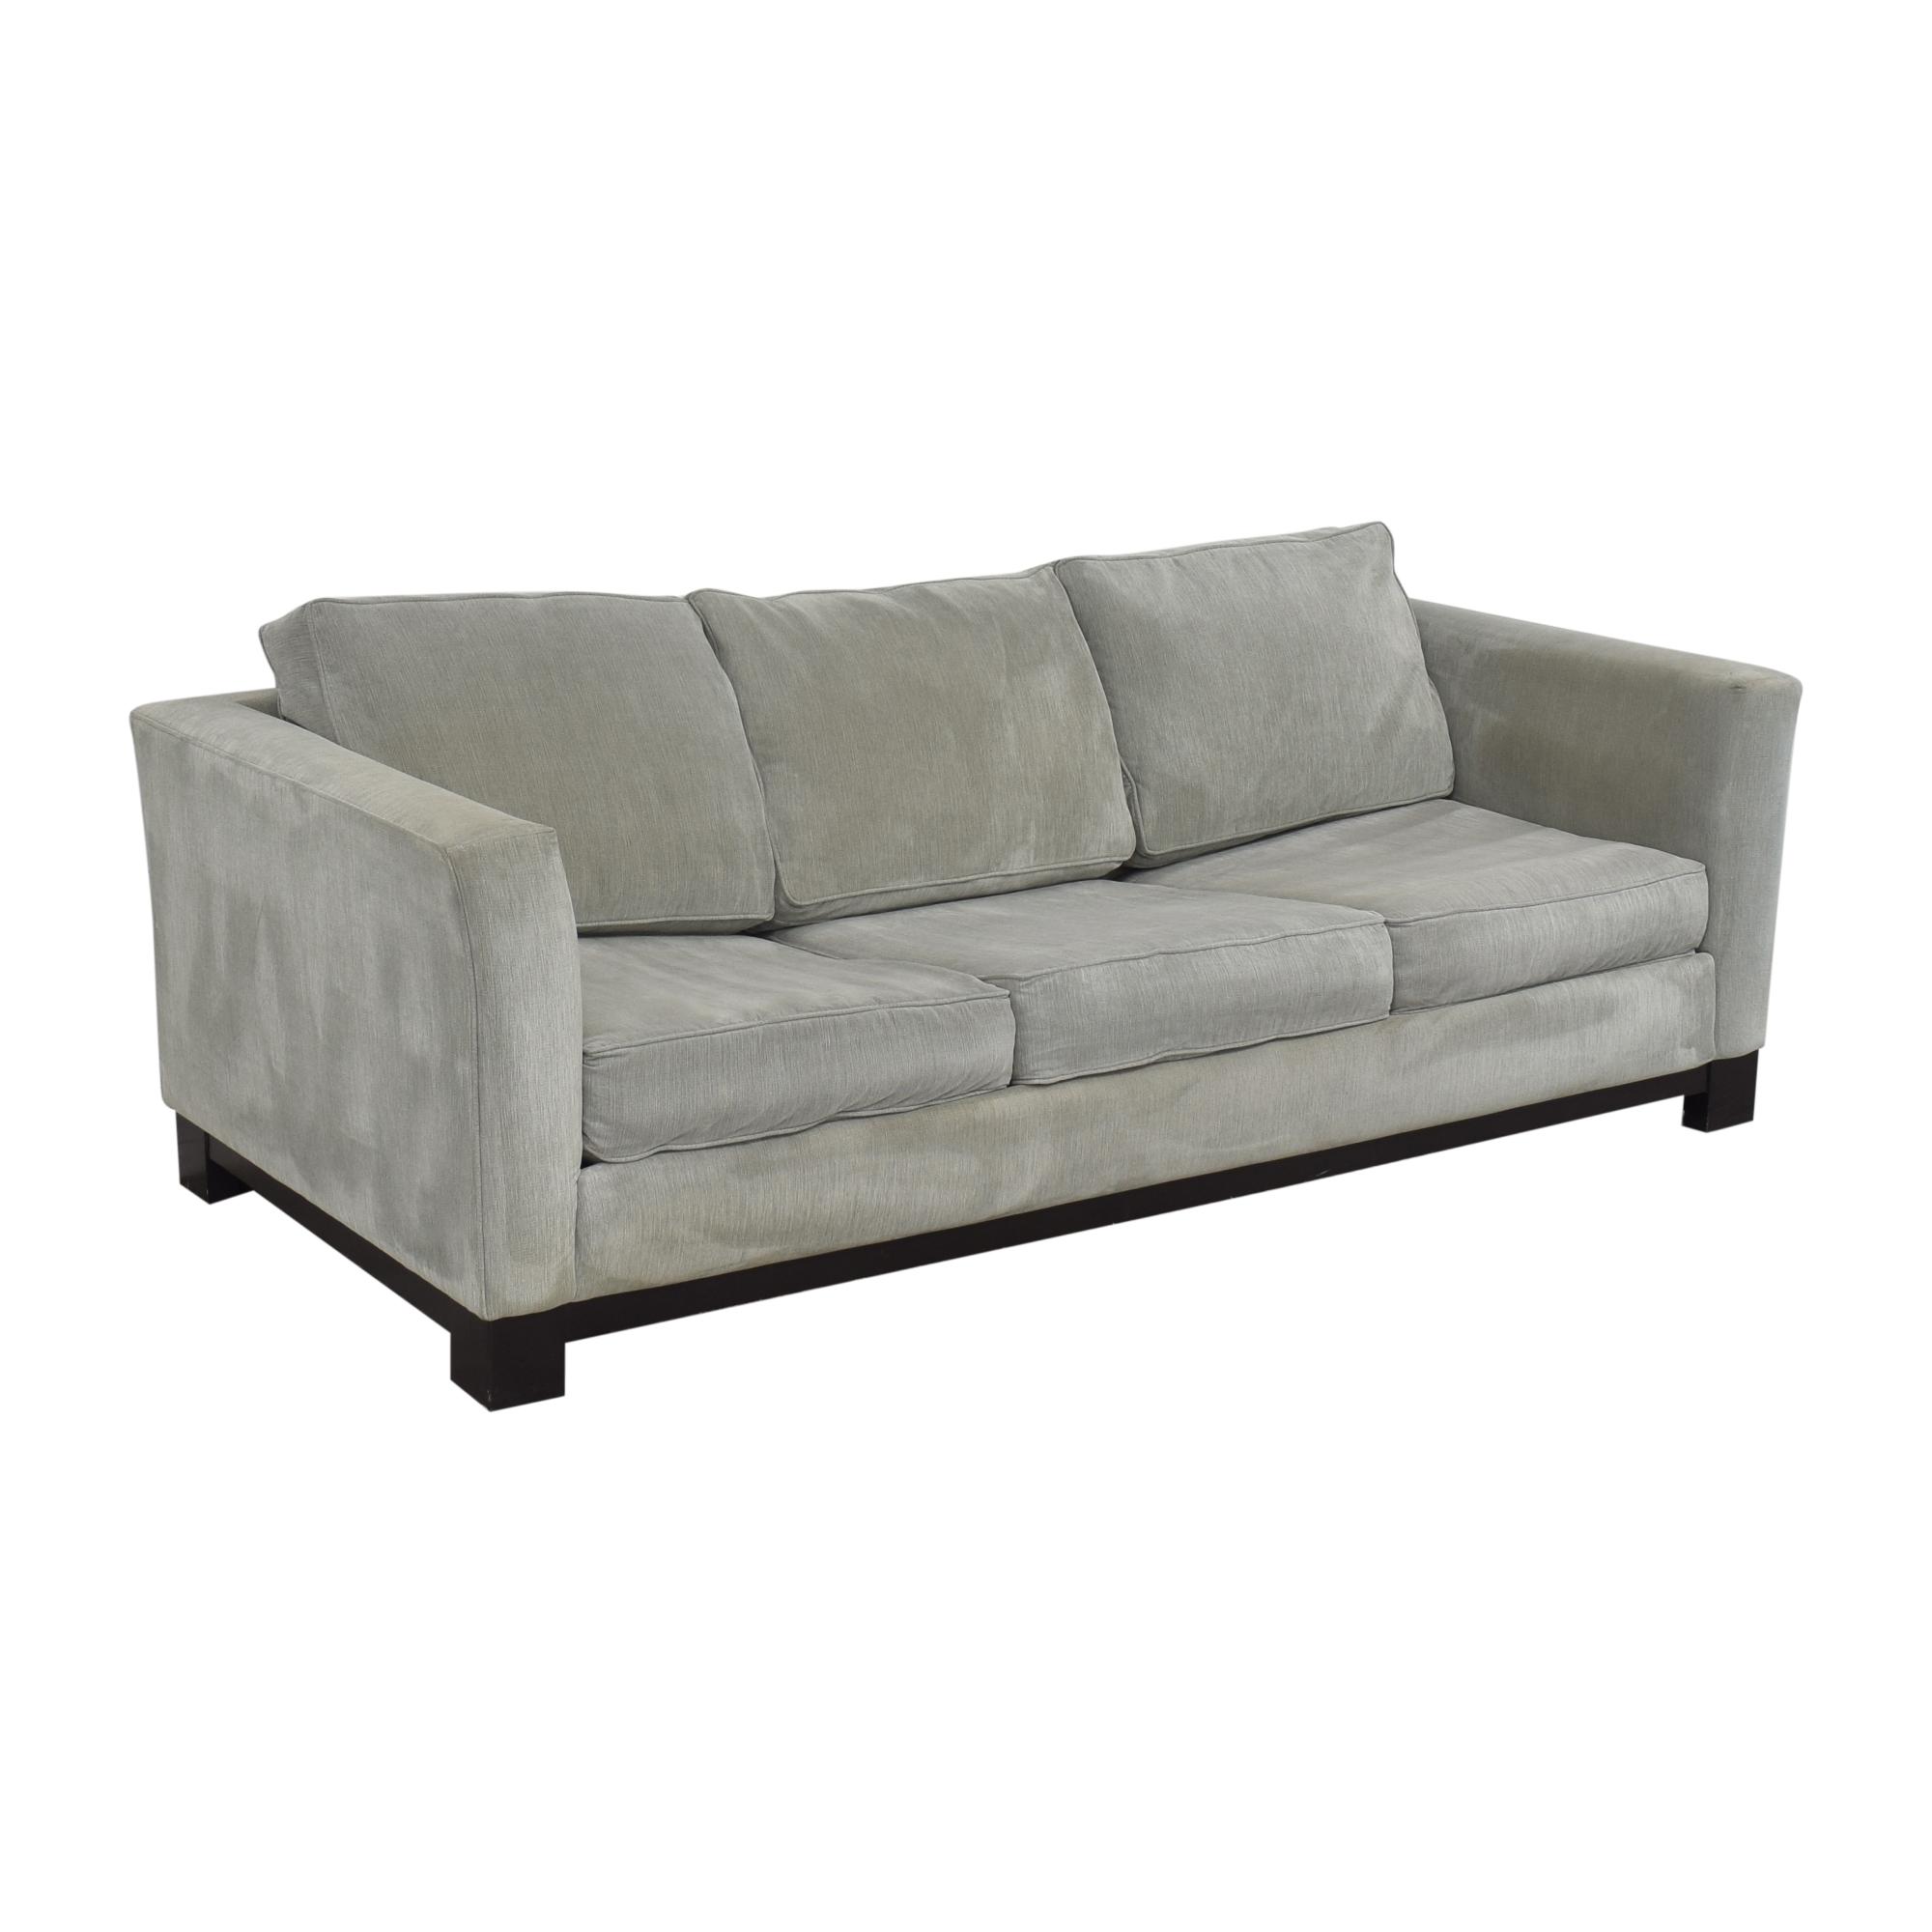 Macy's Macy's Kenton Sleeper Sofa on sale